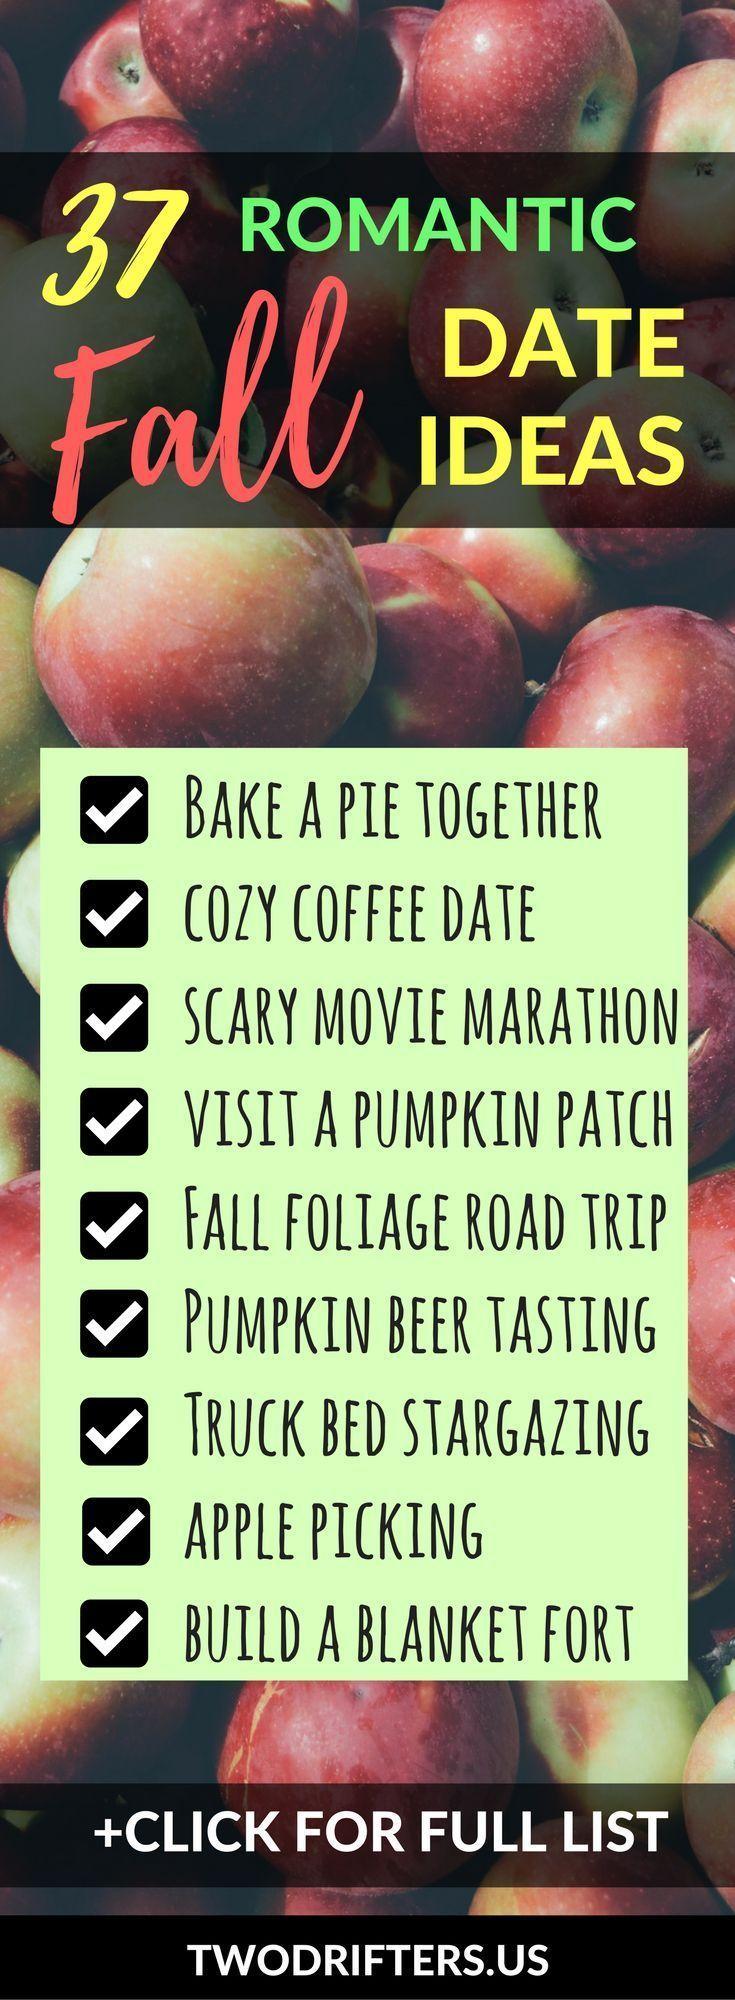 50 Romantic & Adventurous Date Ideas for Fall (2019) #fallbucketlist